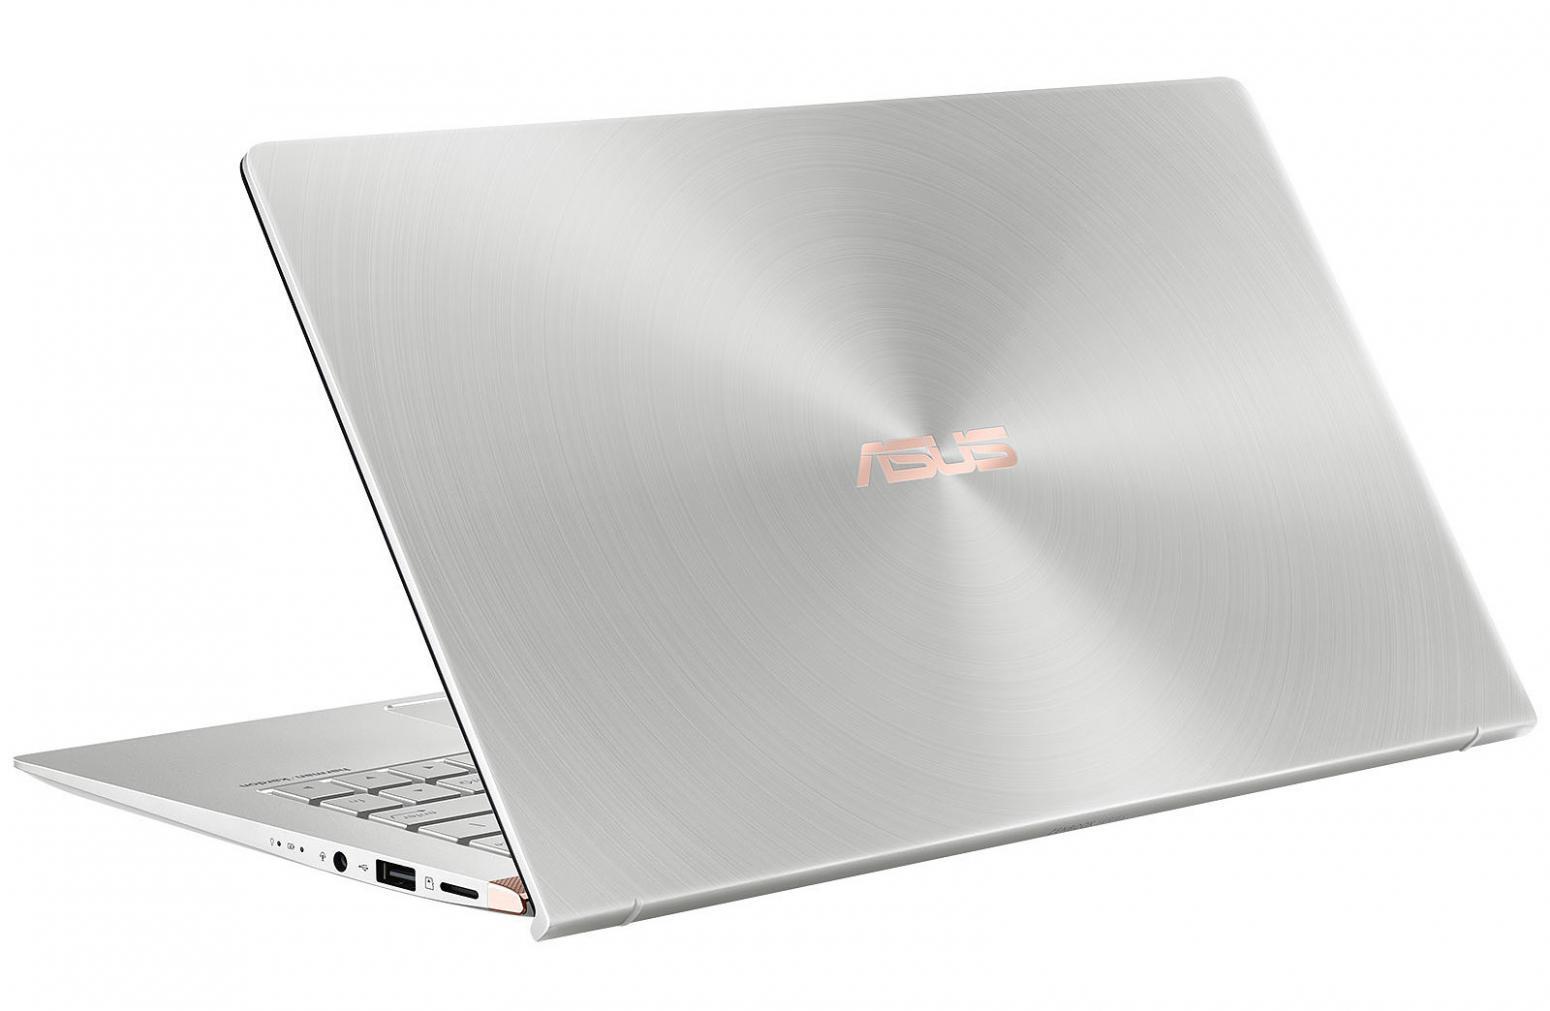 Ordinateur portable Asus Zenbook 13 UX333FA-A3132R Argent - NumPad, Pro - photo 5